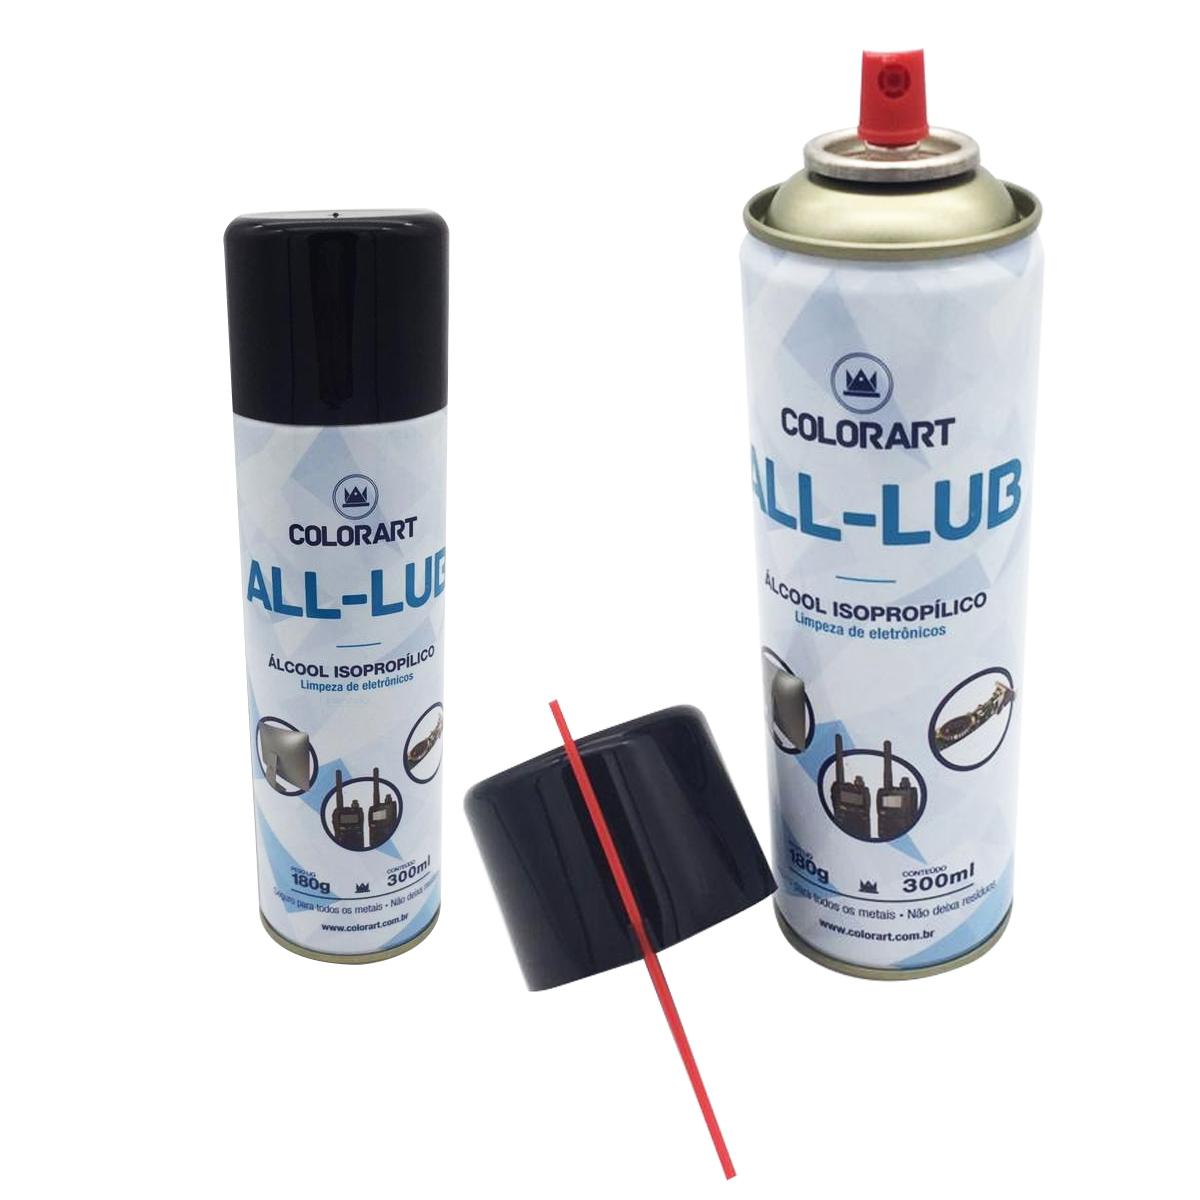 6 Spray Álcool Isopropílico Limeza Eletronicos Celular 300ml